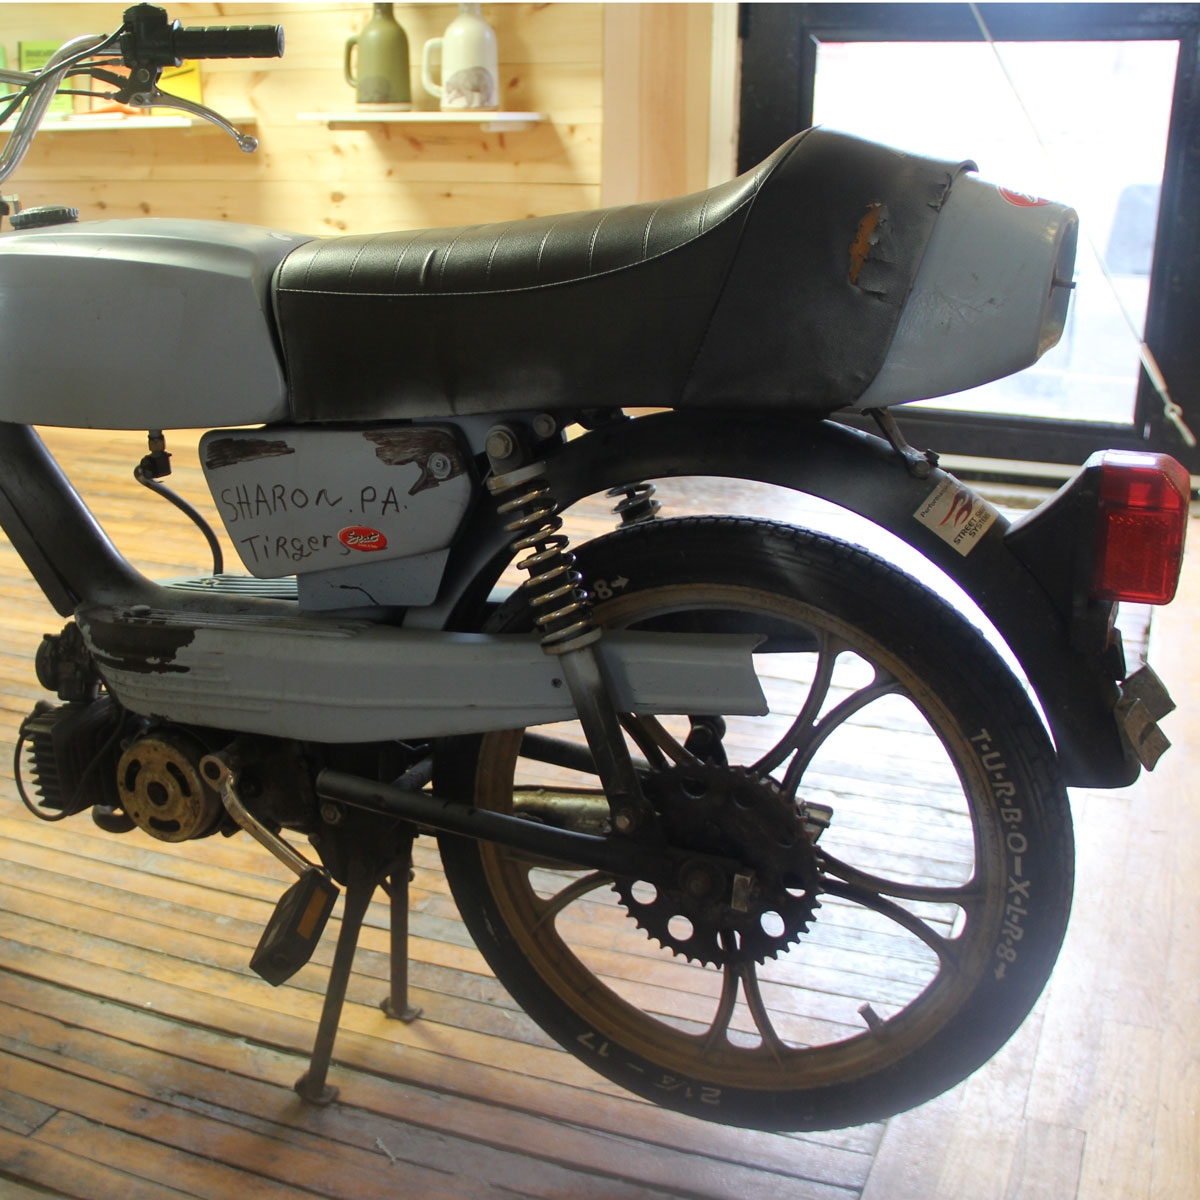 MotoMarina Sebring With Minarelli V1 Project Moped